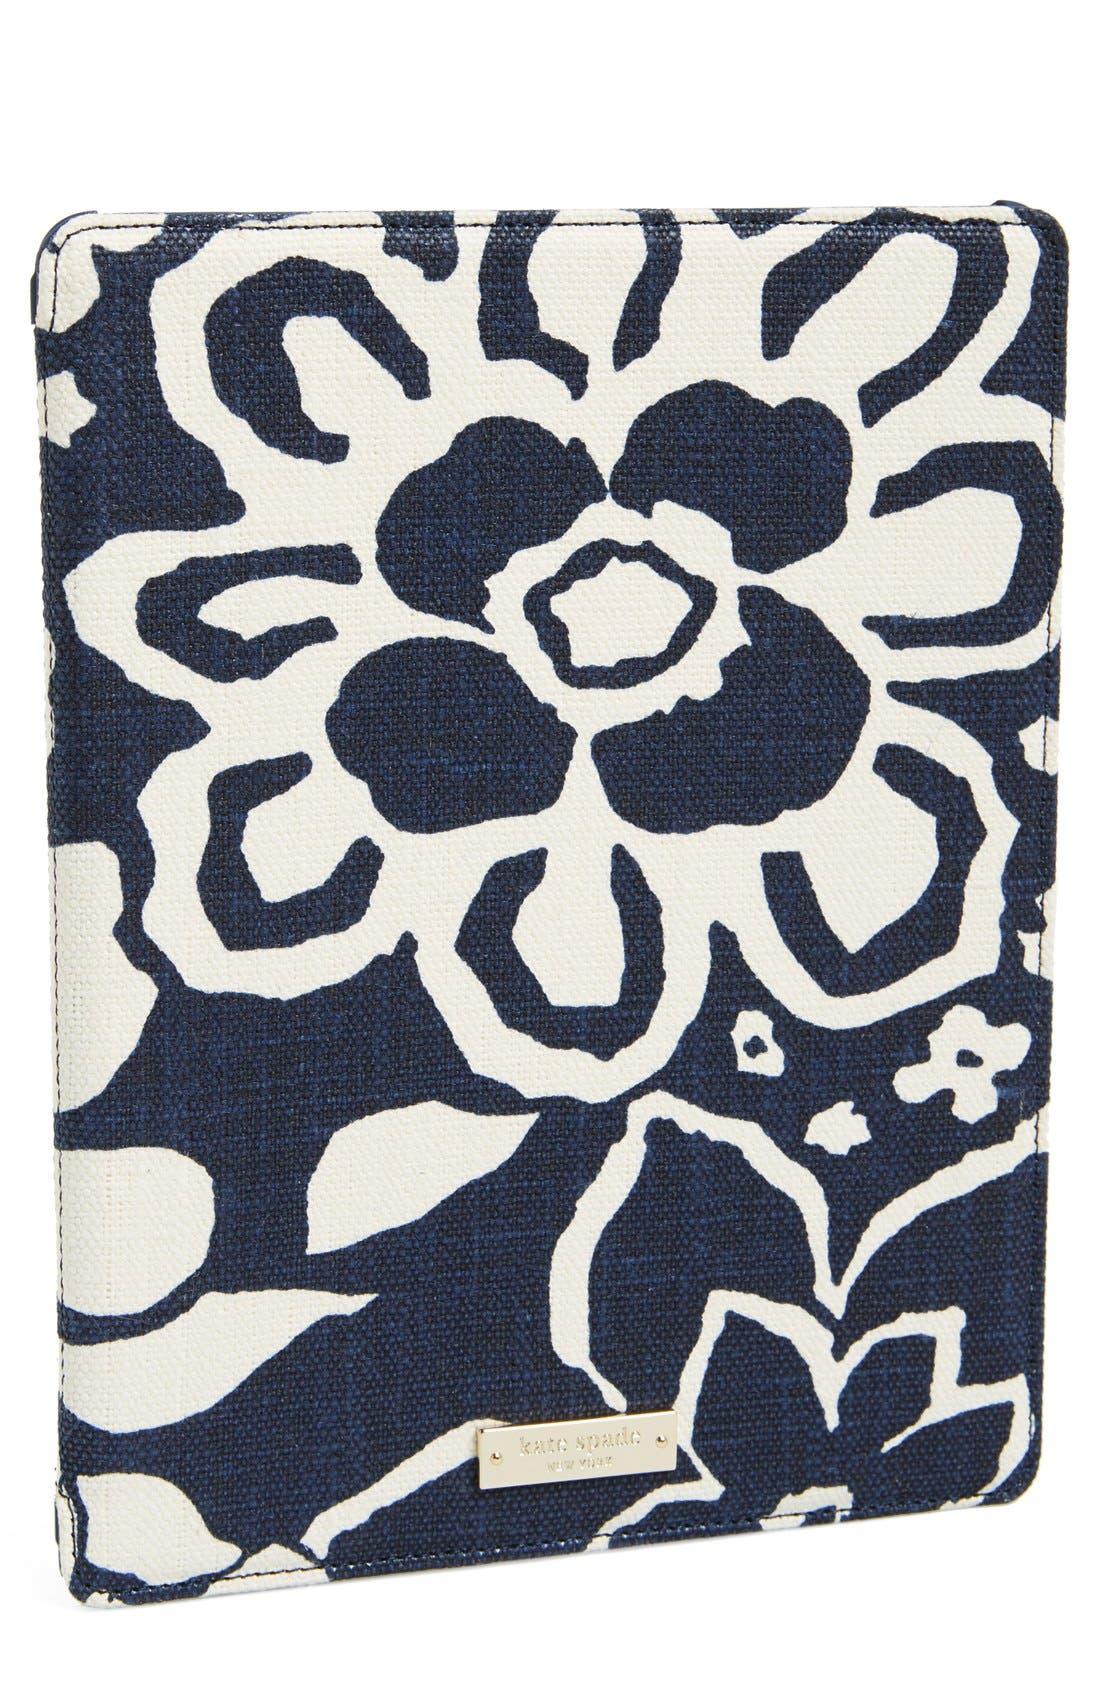 Main Image - kate spade new york 'monaco floral' iPad 2 & 3 folio